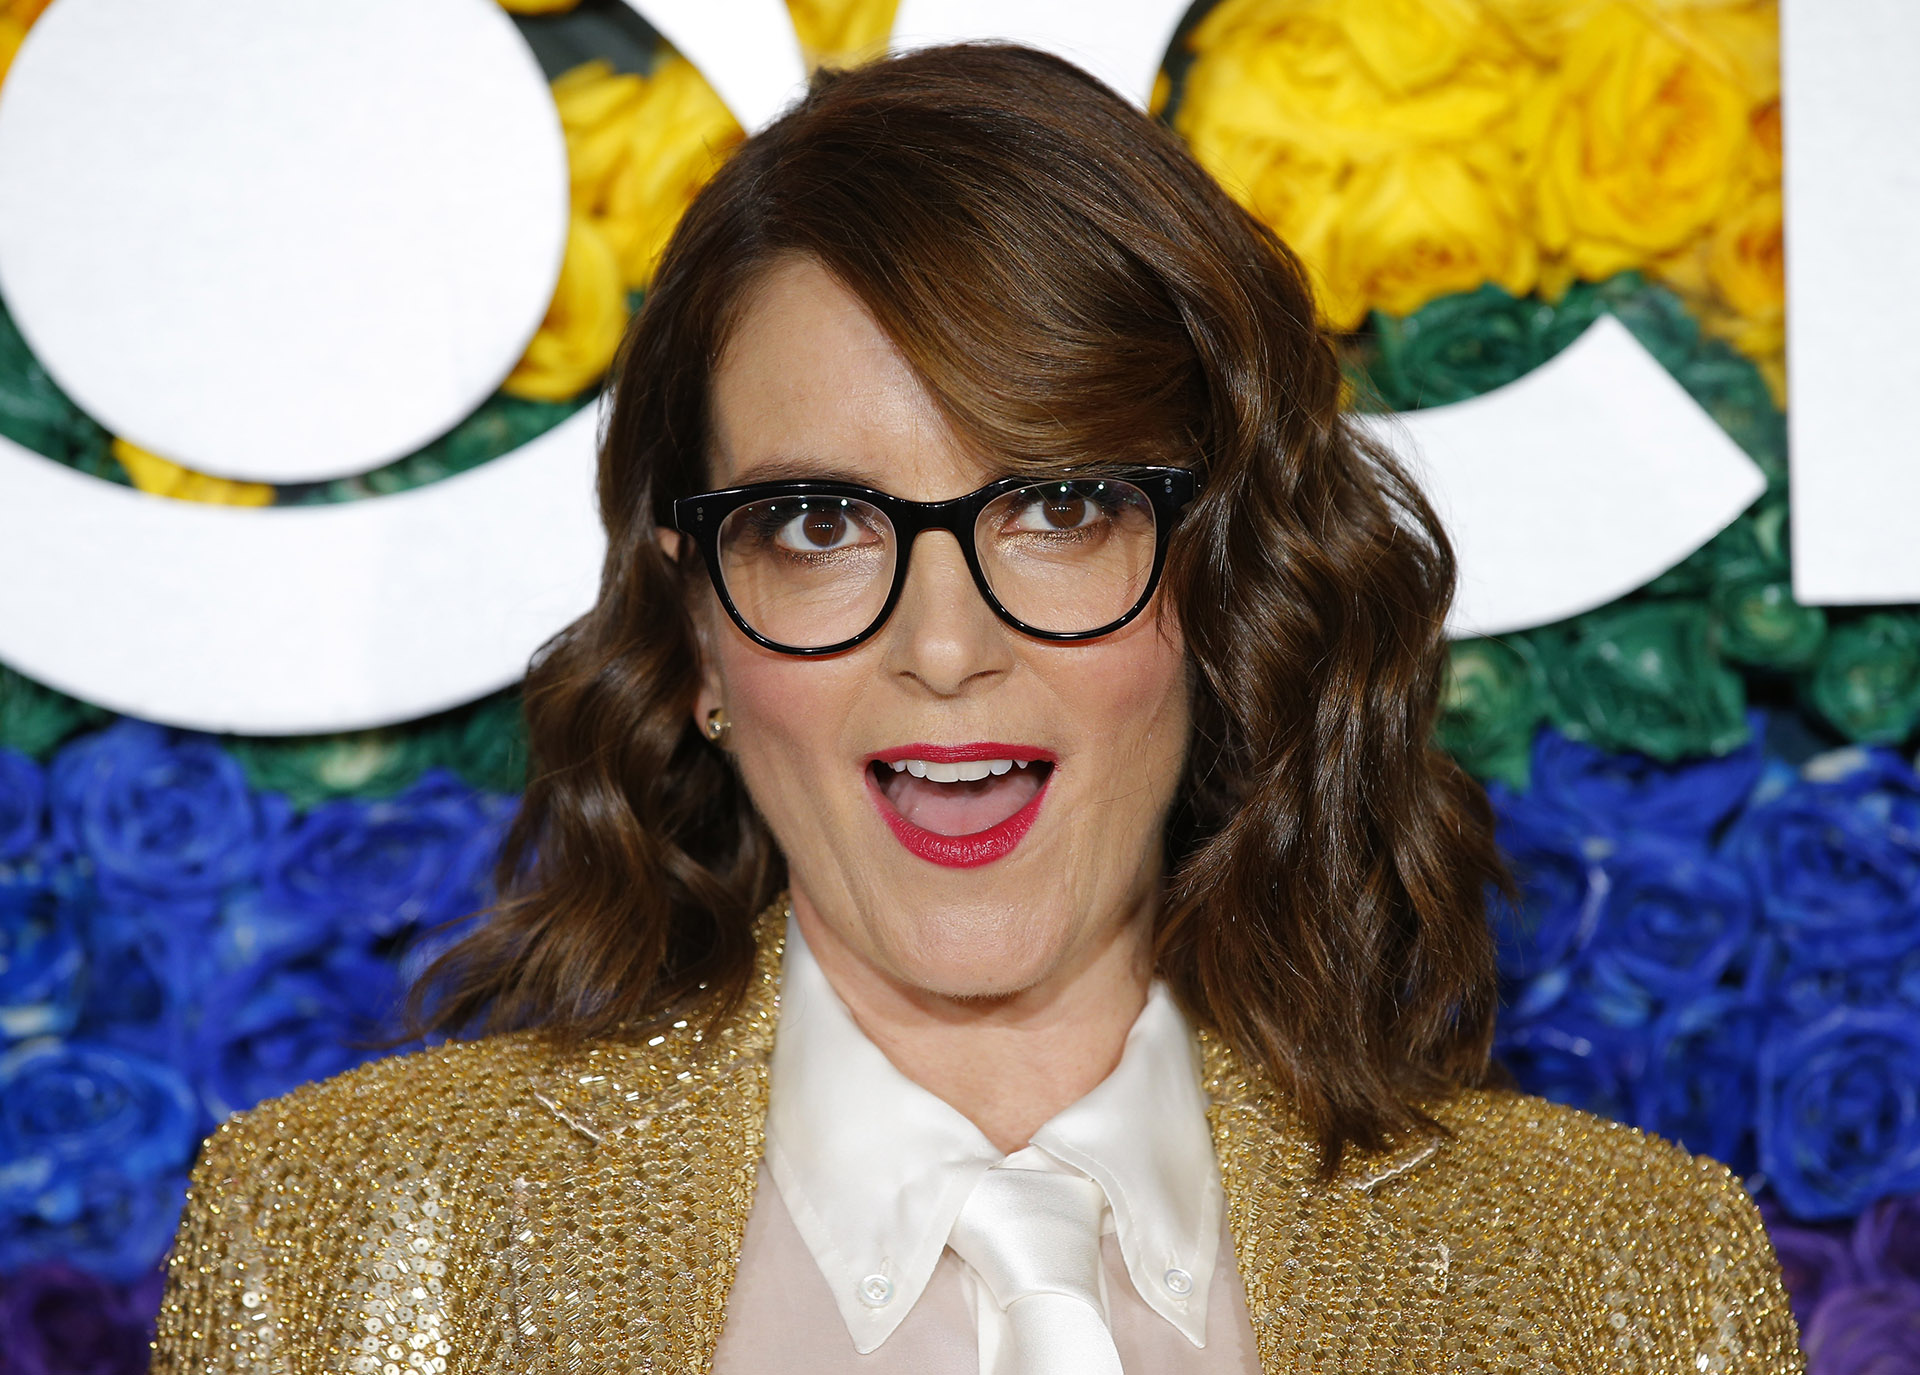 La comediante Tina Fey